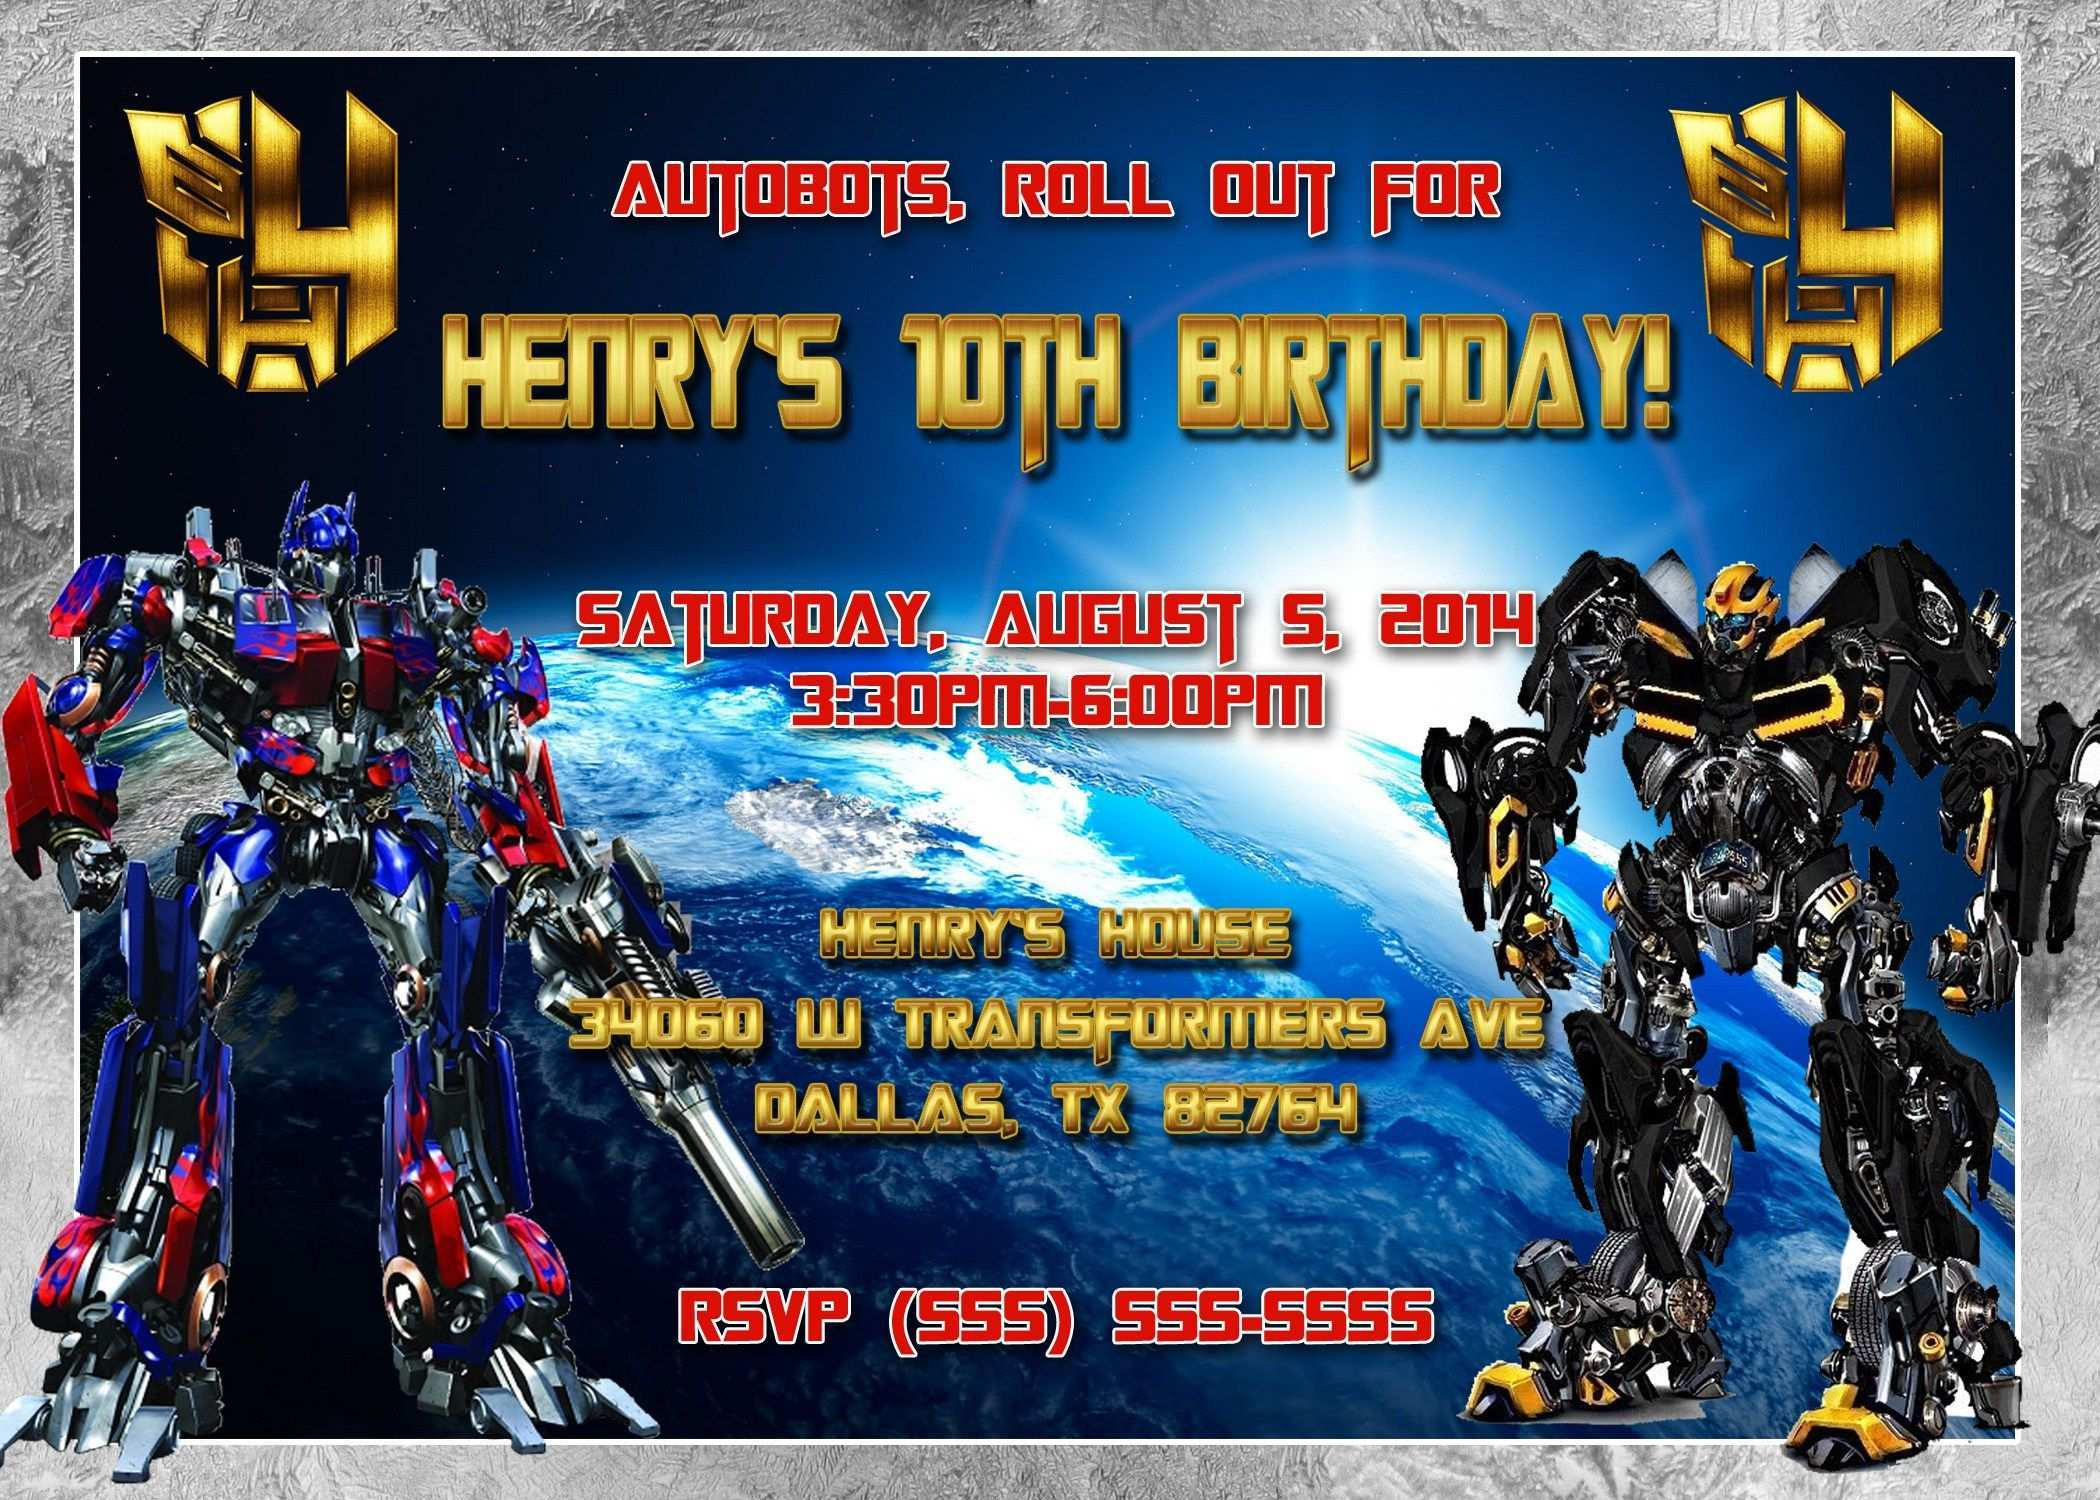 55 Visiting Transformers Birthday Invitation Template For Free with Transformers Birthday Invitation Template